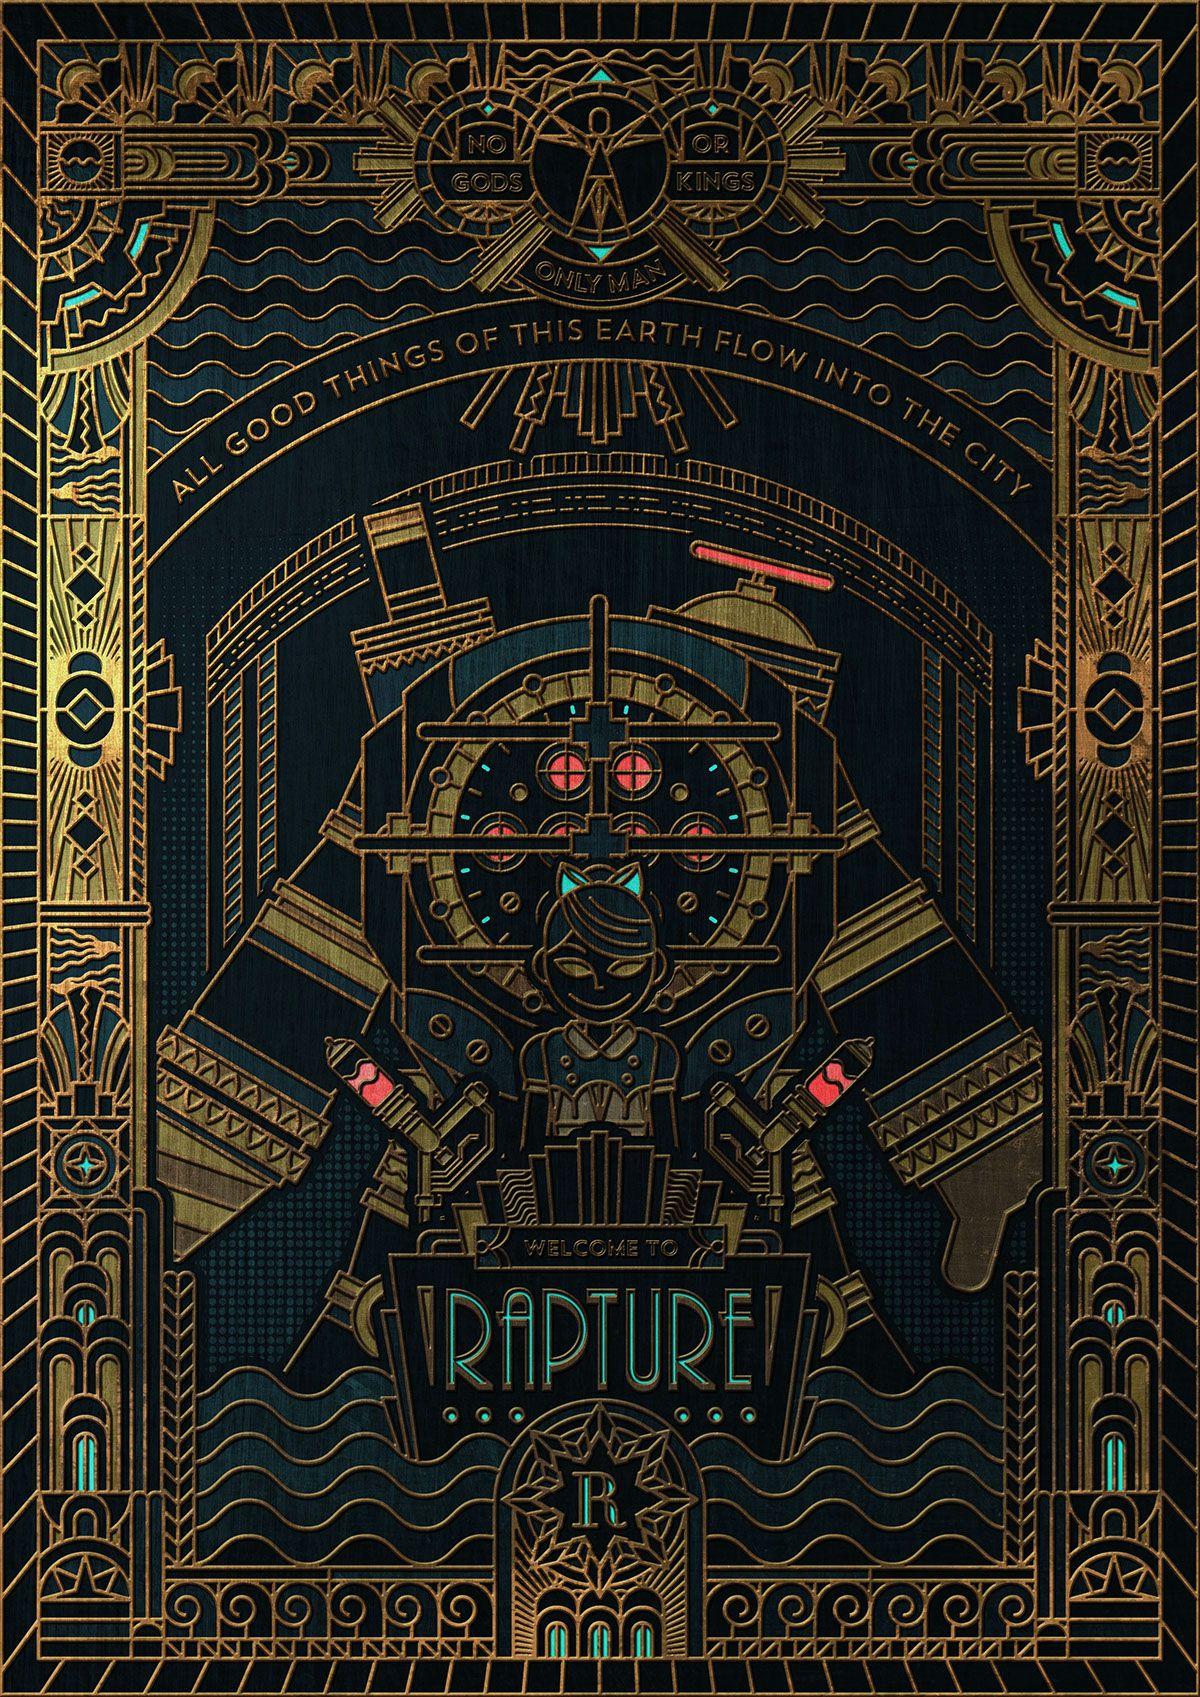 Bioshock Rapture Hd Desktop Wallpaper Wallpapersme Bioshock Bioshock Rapture Bioshock Art